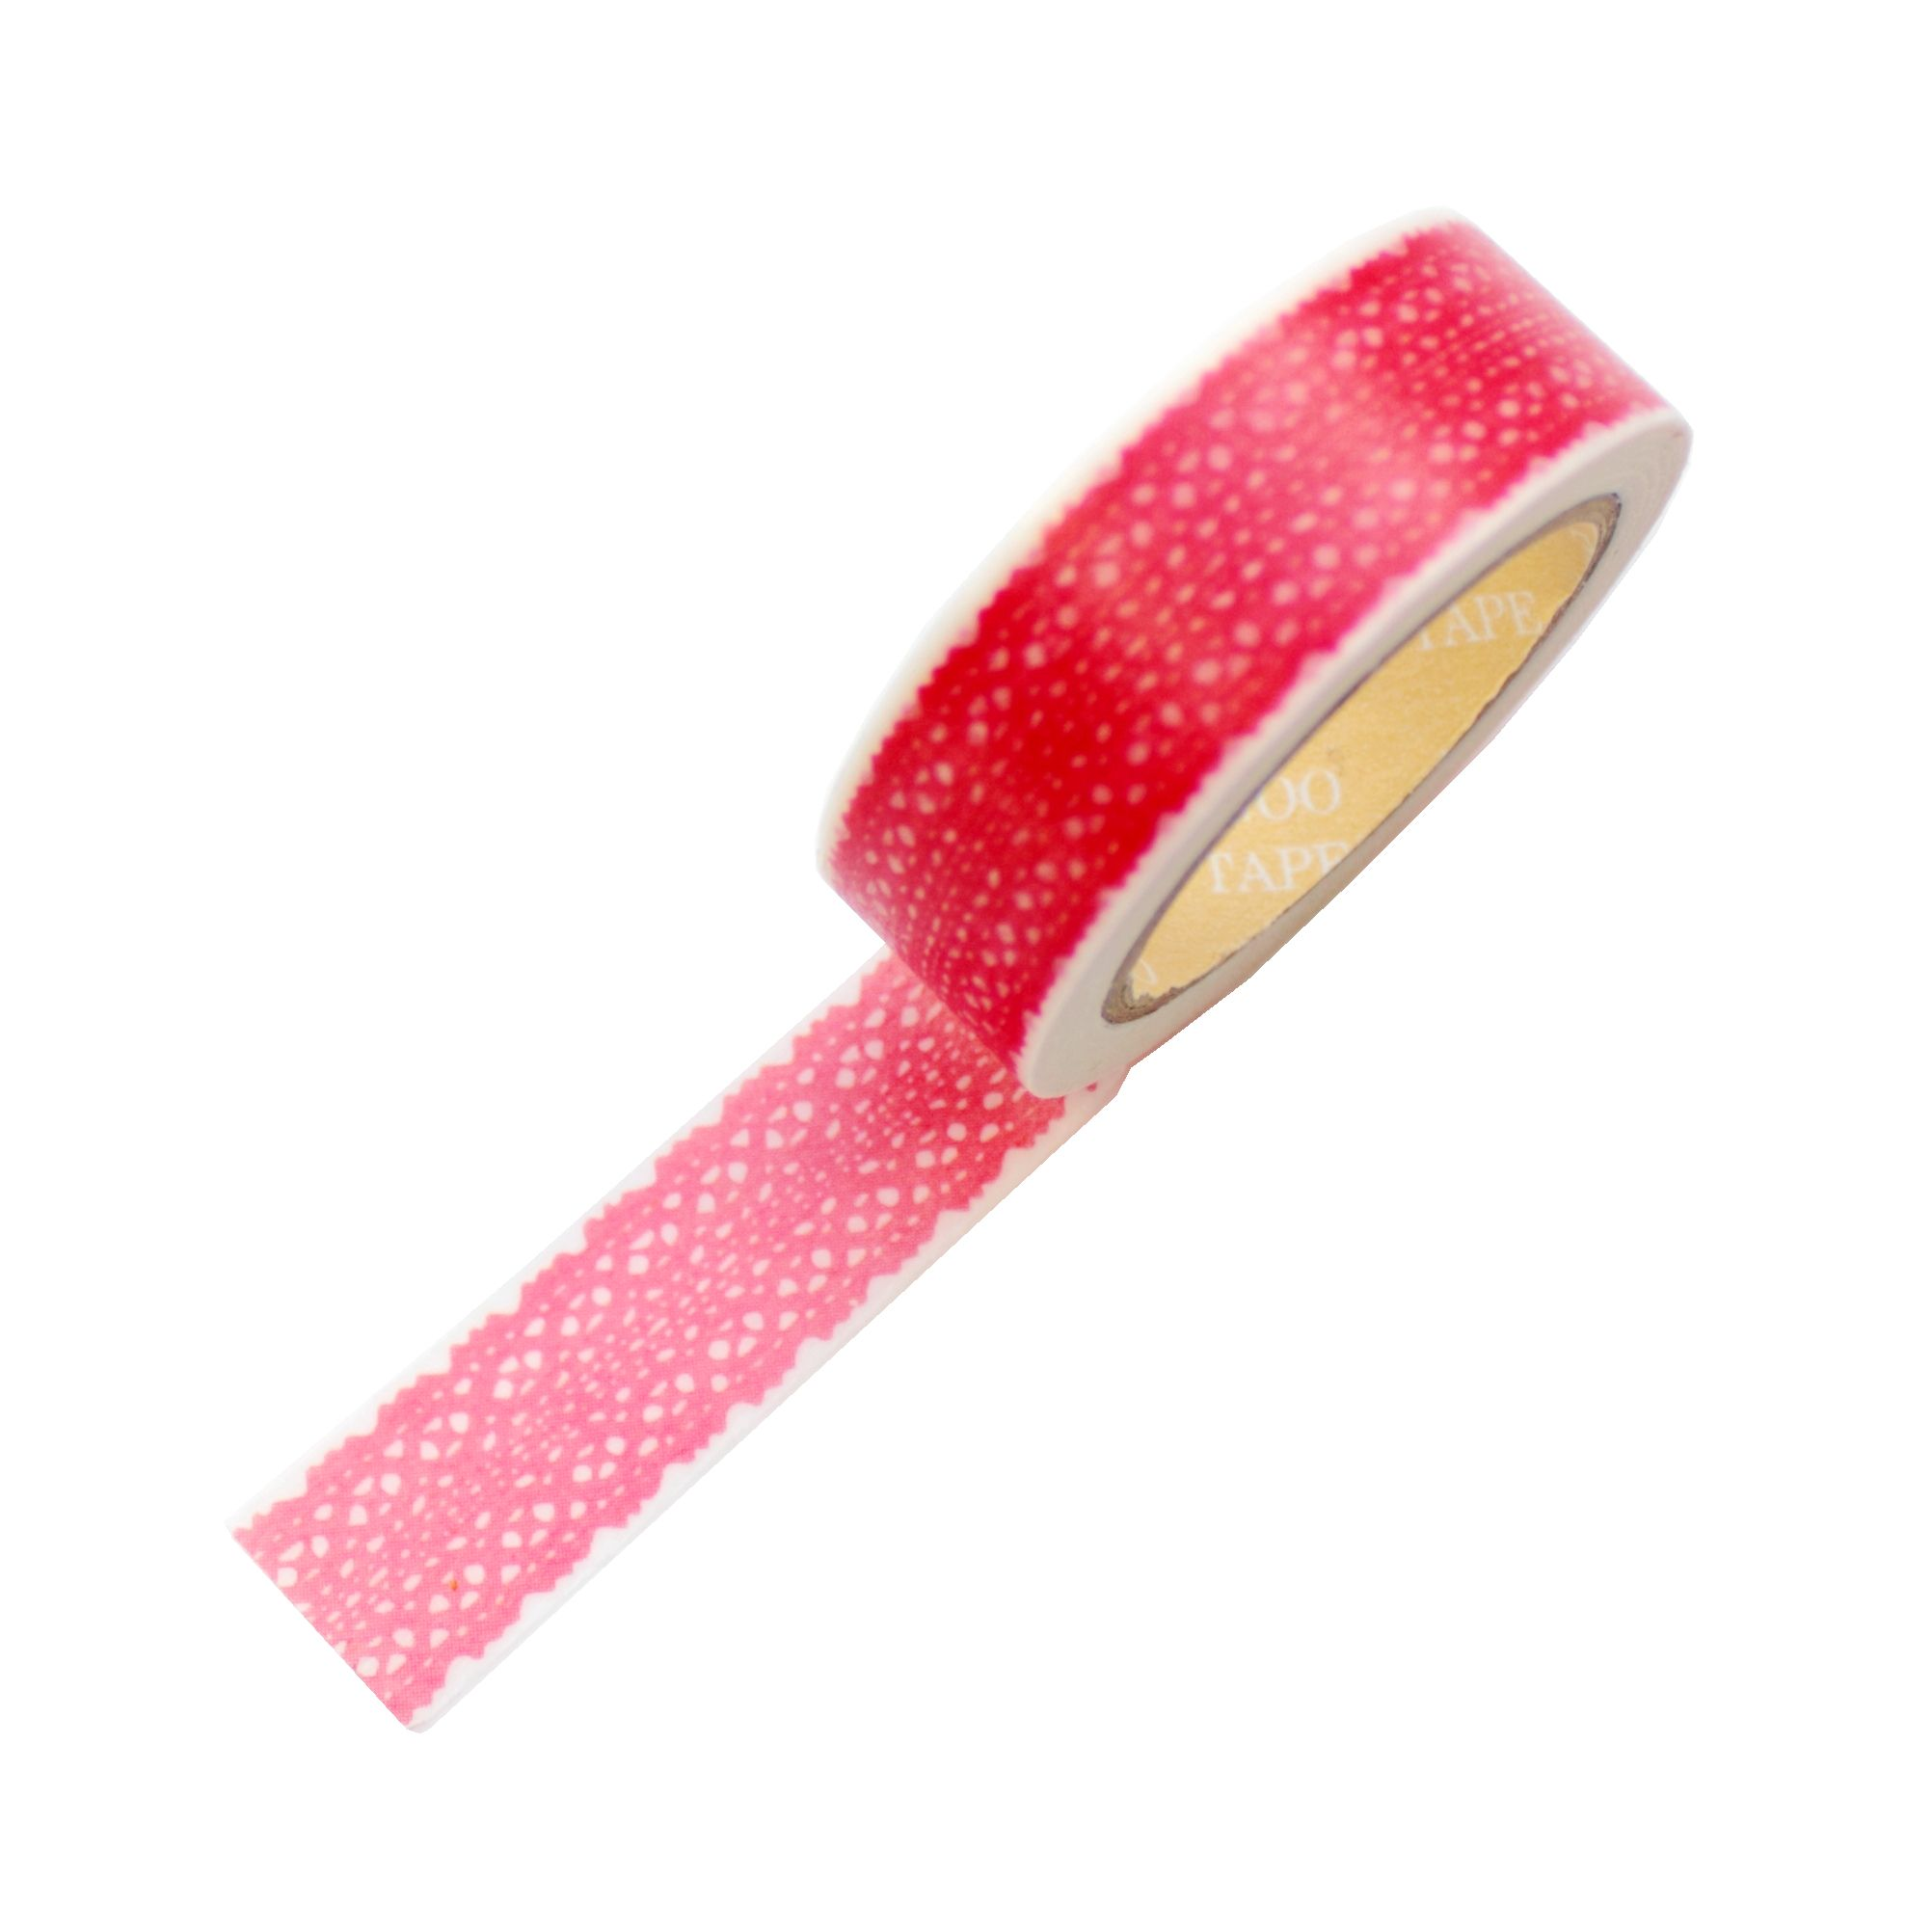 Washi tape dentelle : http://www.belledecoeur.com/deco-tape.html